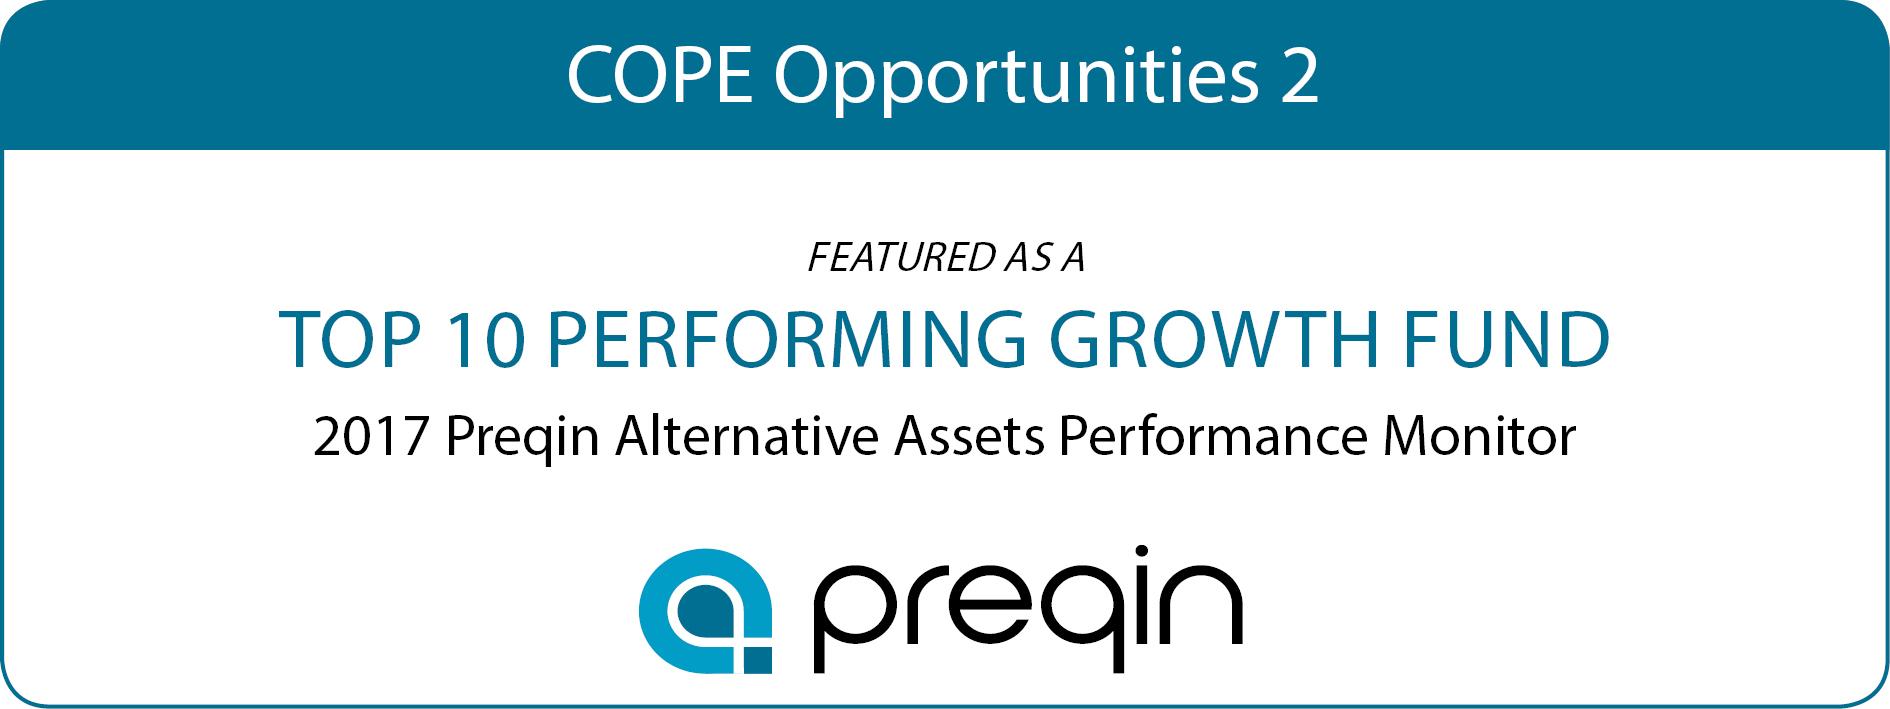 growth fund performance